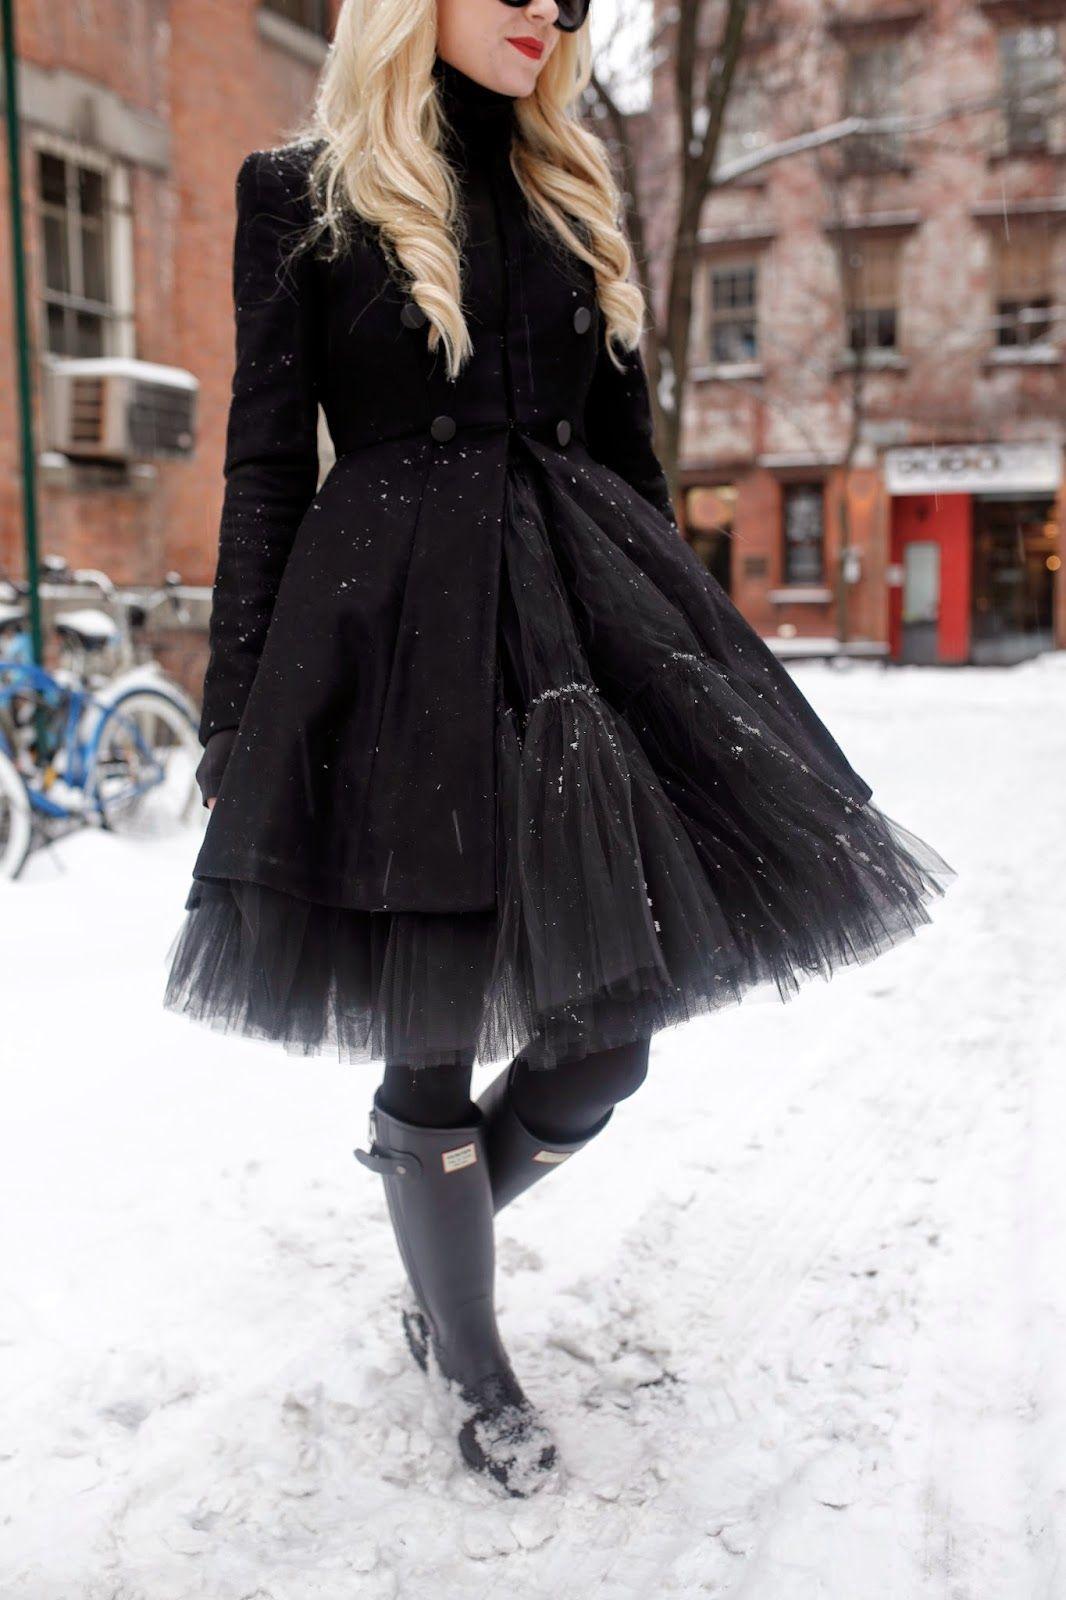 Dark Snow Atlantic Pacific Black Tulle Skirt Outfit Tulle Skirt Black Tulle Skirts Outfit [ 1600 x 1066 Pixel ]